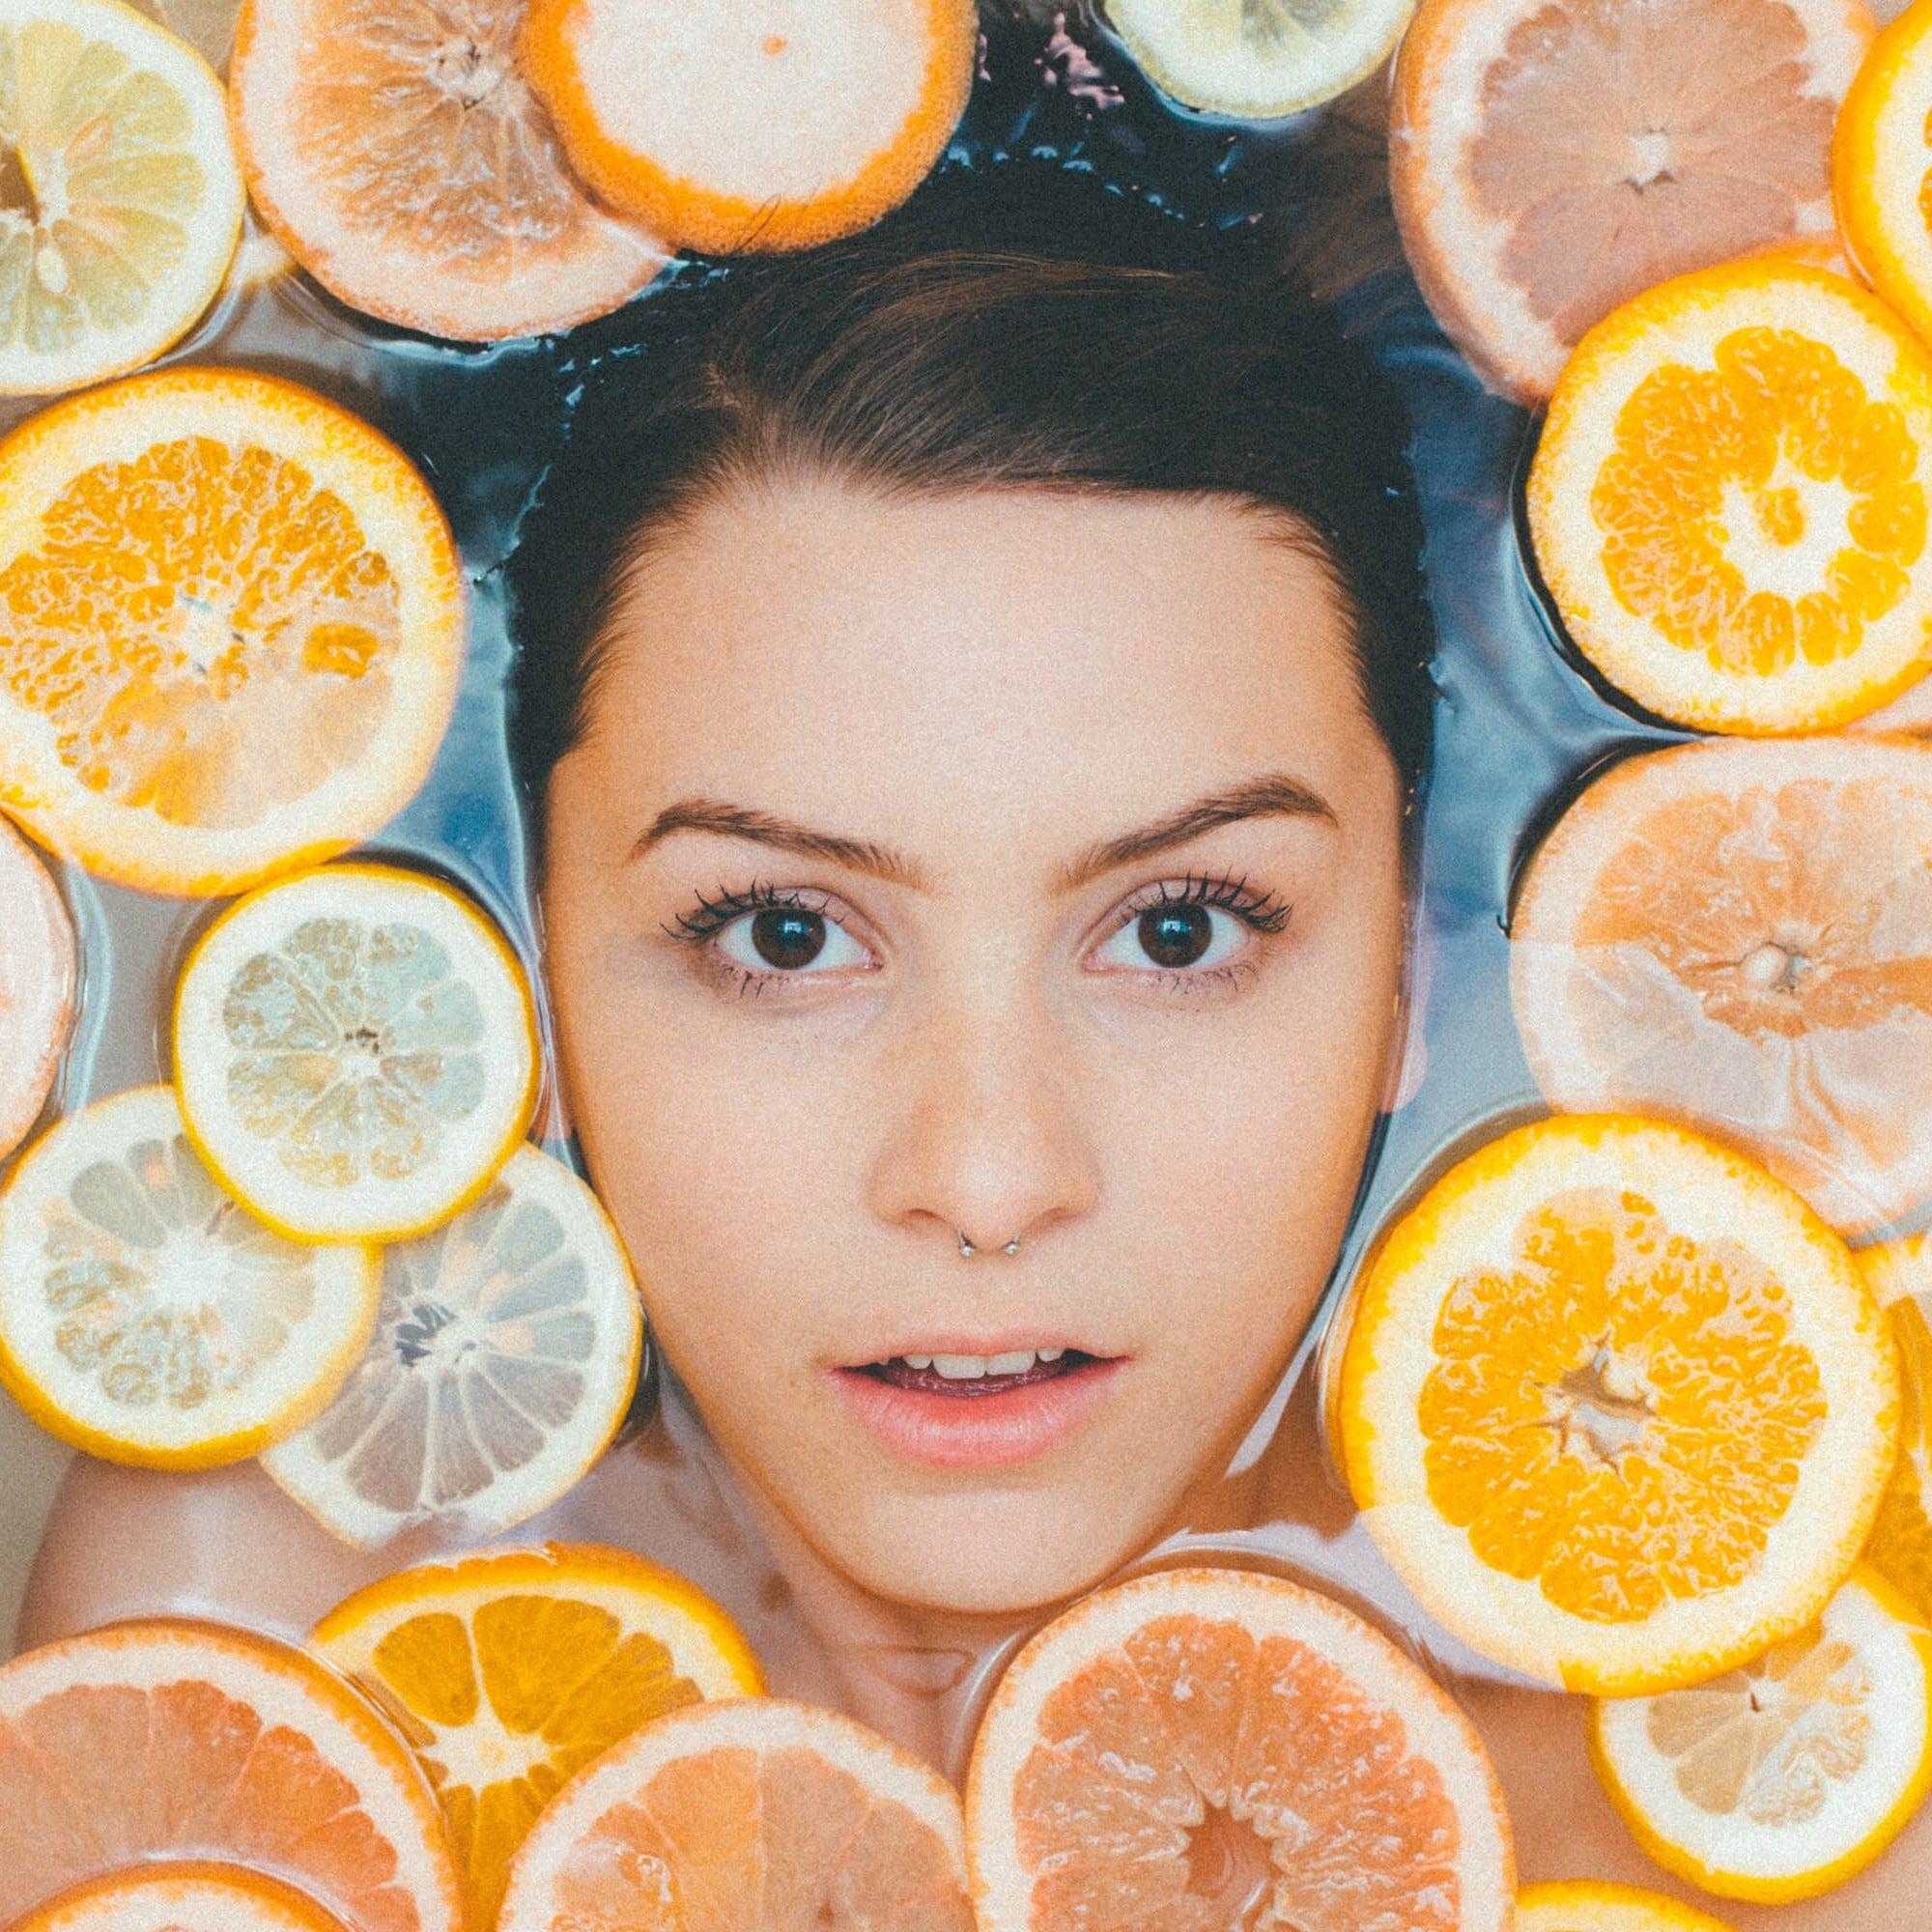 Should I Use Vitamin C in My Skincare? | POPSUGAR Beauty Australia